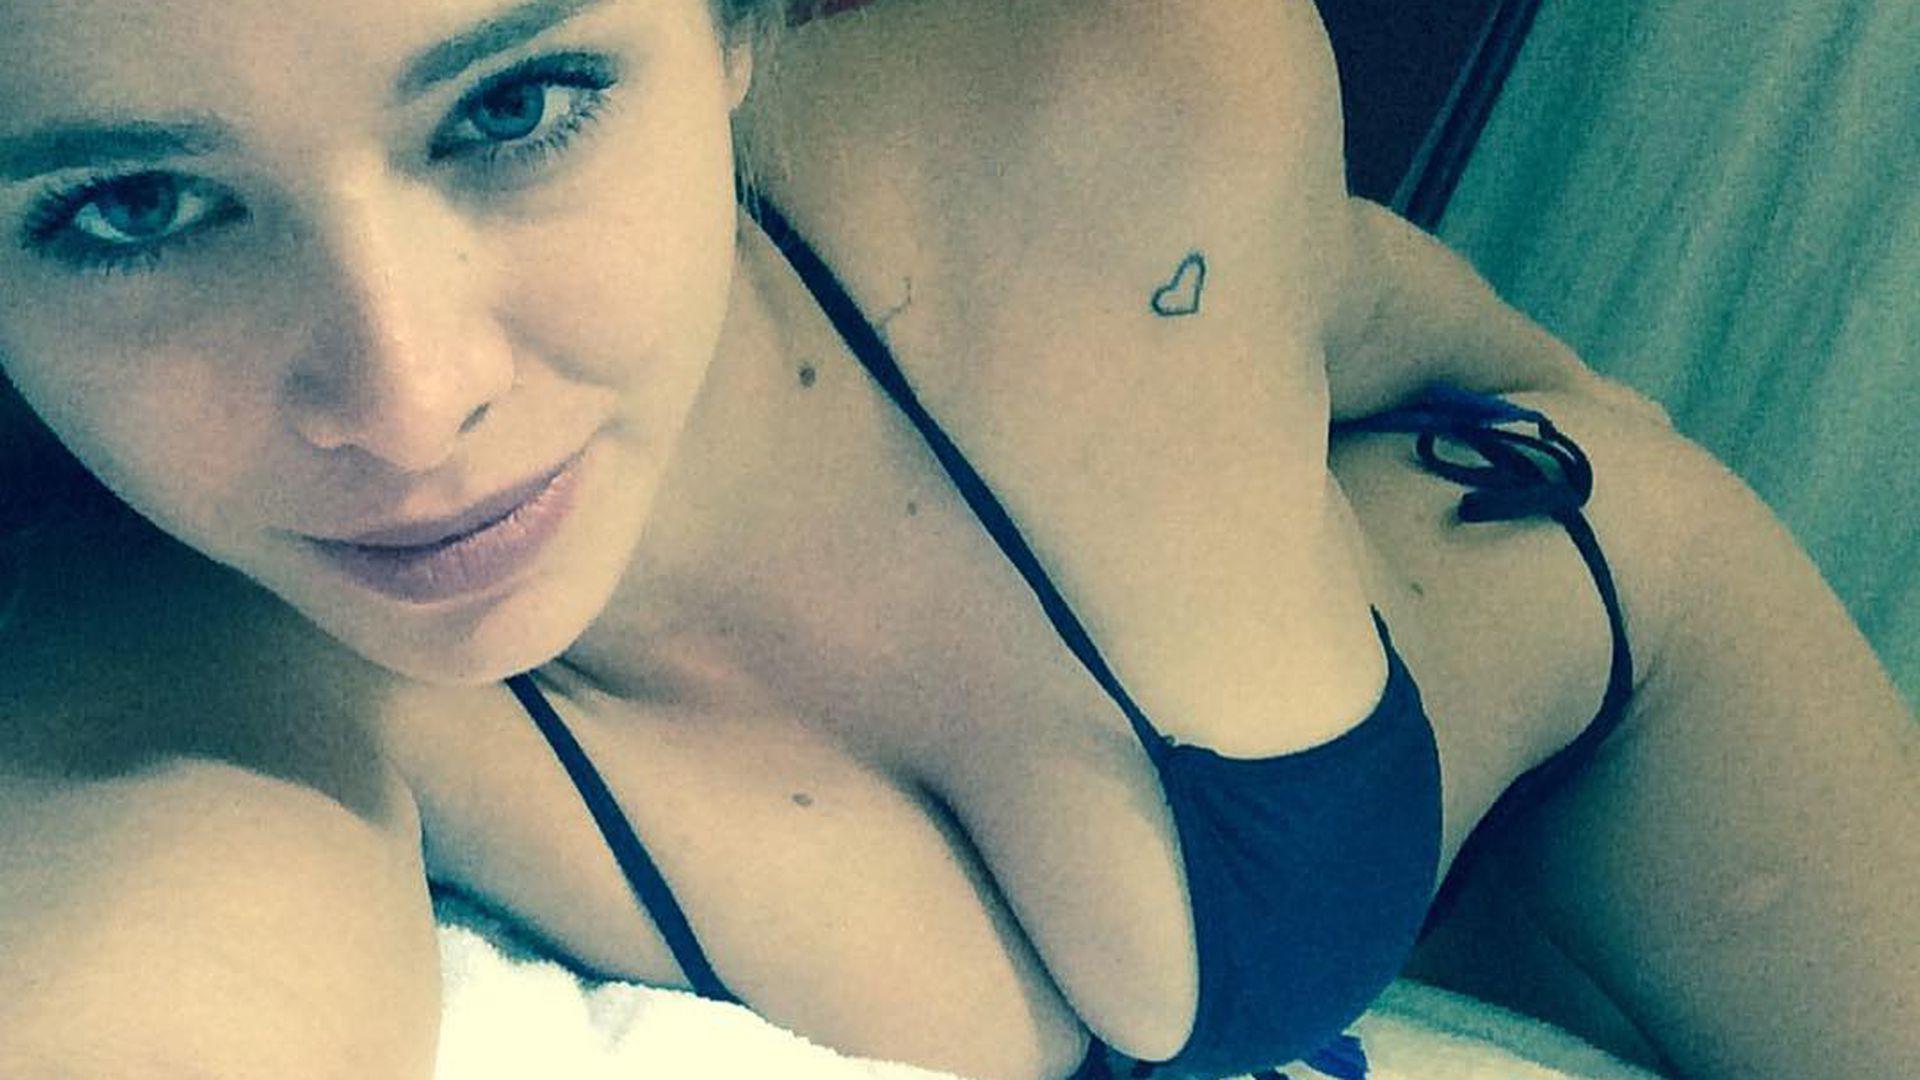 Möpse-Sponsor: Wer hat Saskia Atzerodts Brüste bezahlt